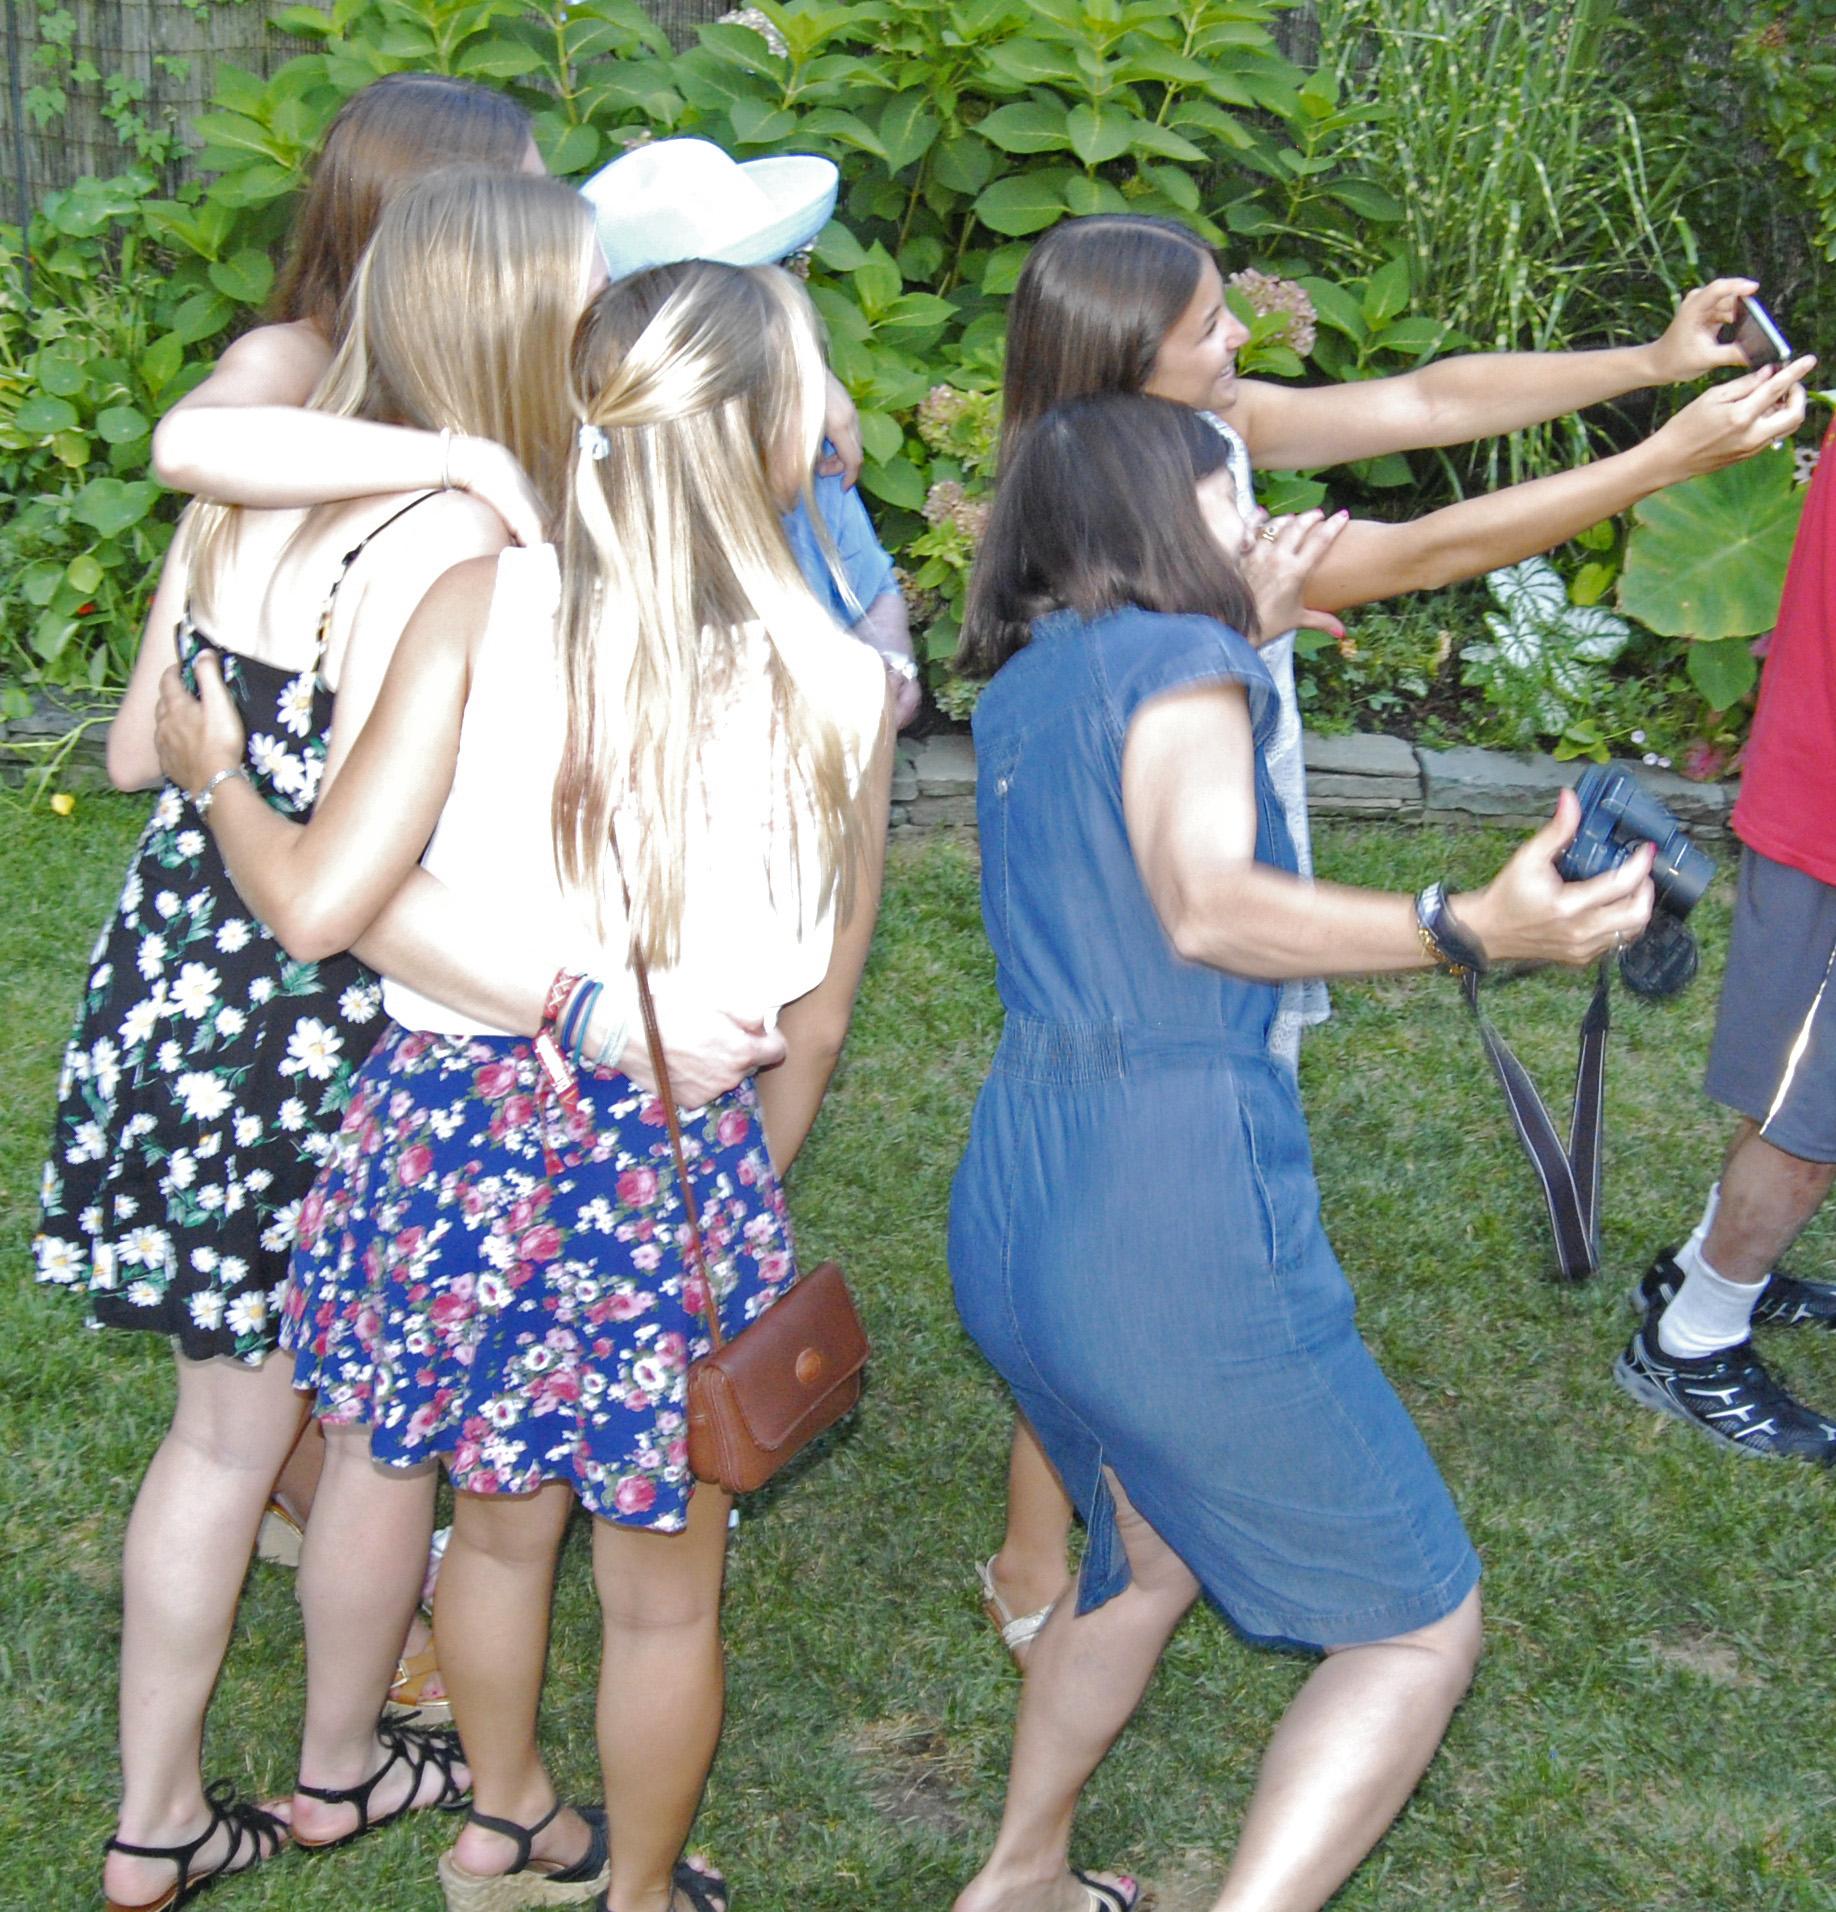 ML, Claire, & girls selfie 2